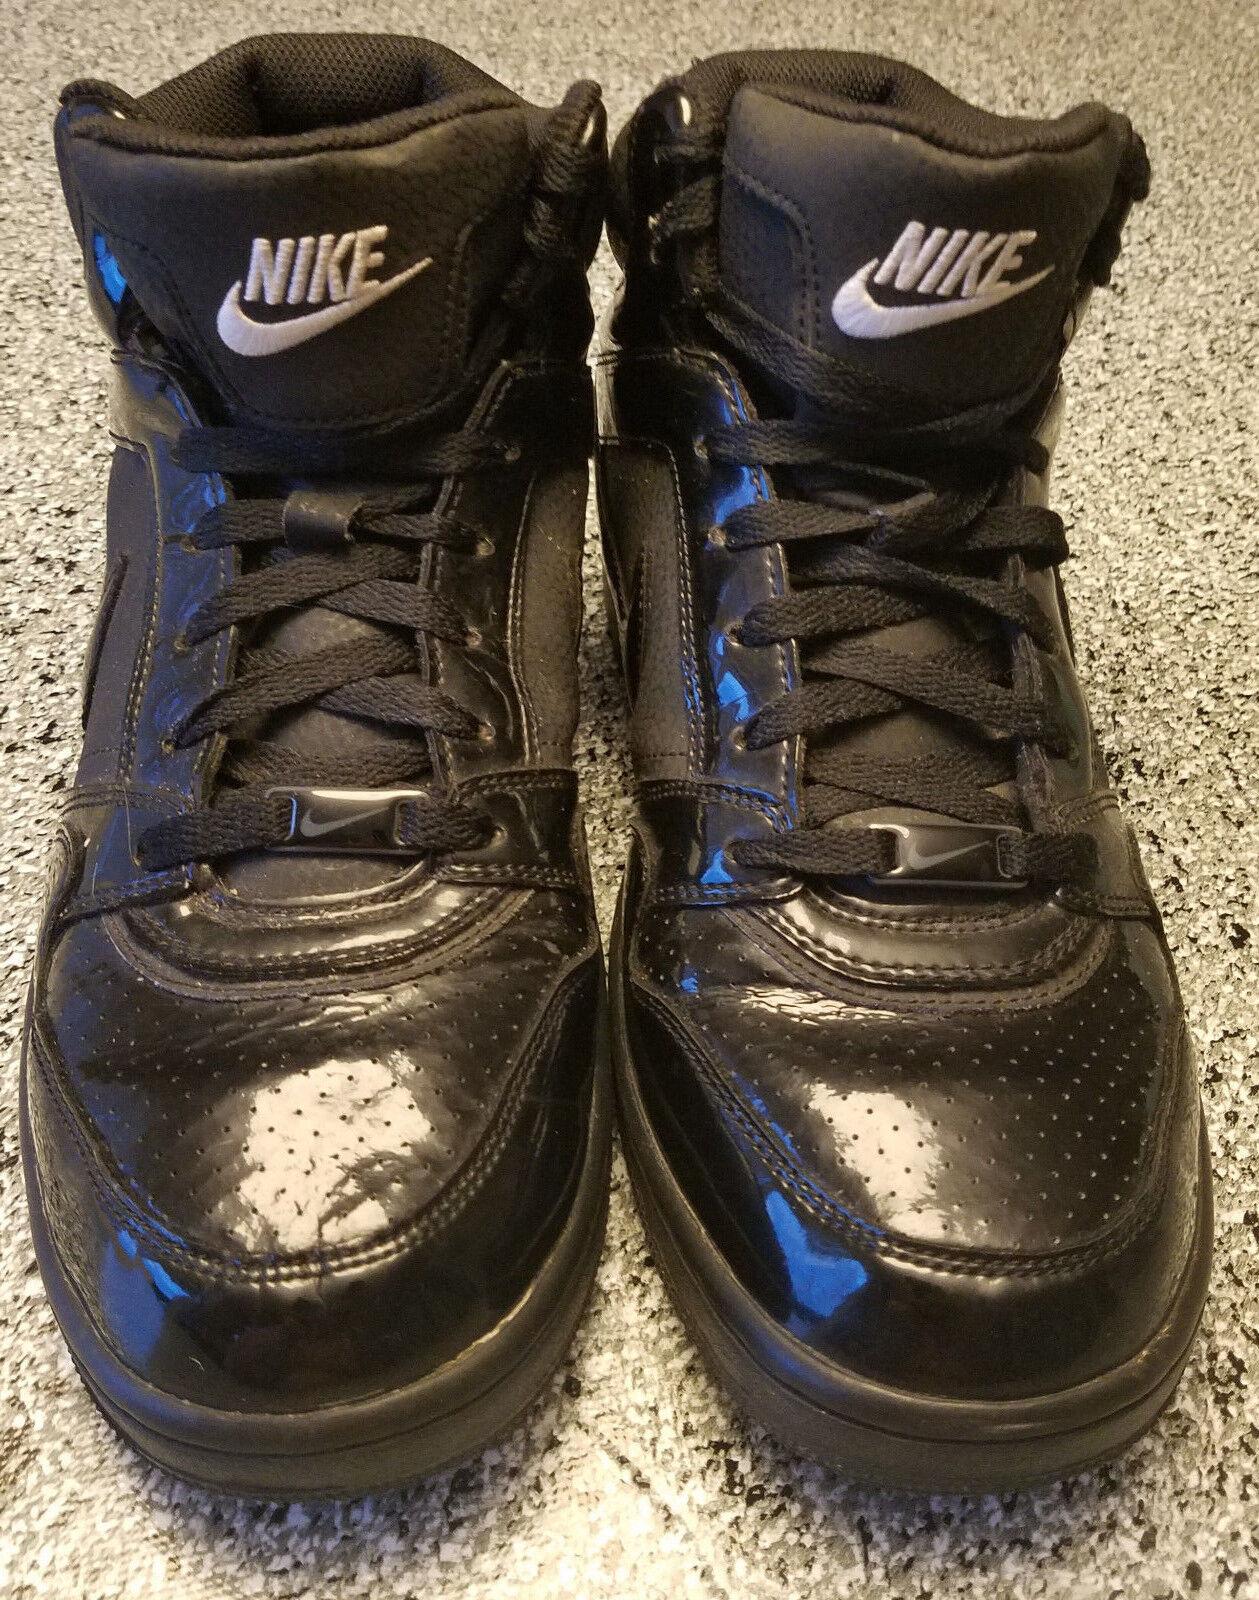 Nike Air Negro prestiege 407036-090 High Top Shoes baratos Hombre SZ 8,5 m baratos Shoes zapatos de mujer zapatos de mujer 34137d